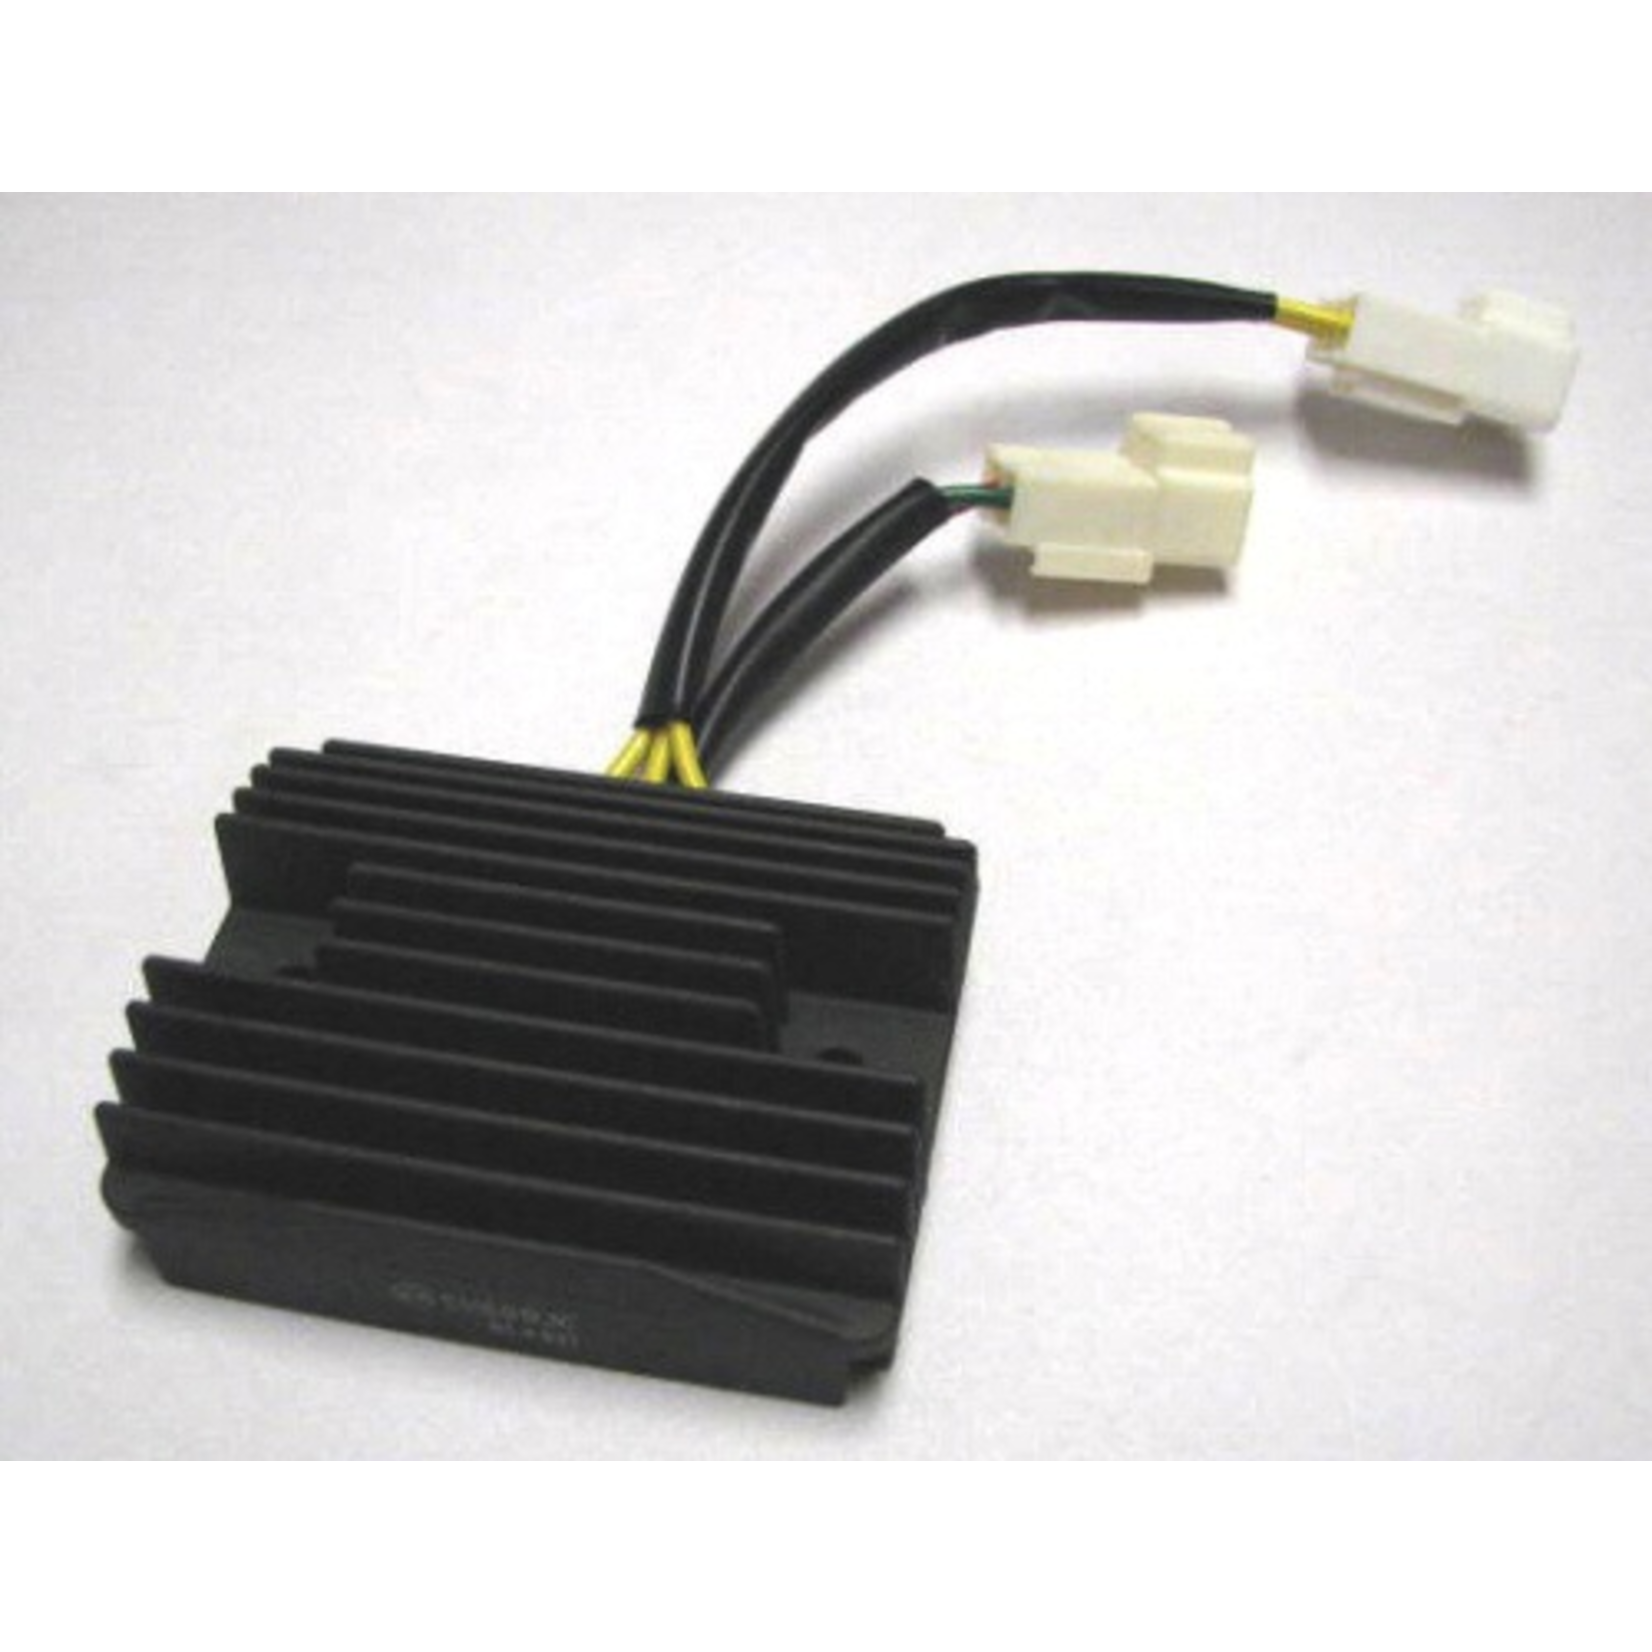 Parts Voltage Regulator, GTS300, GTV250/300